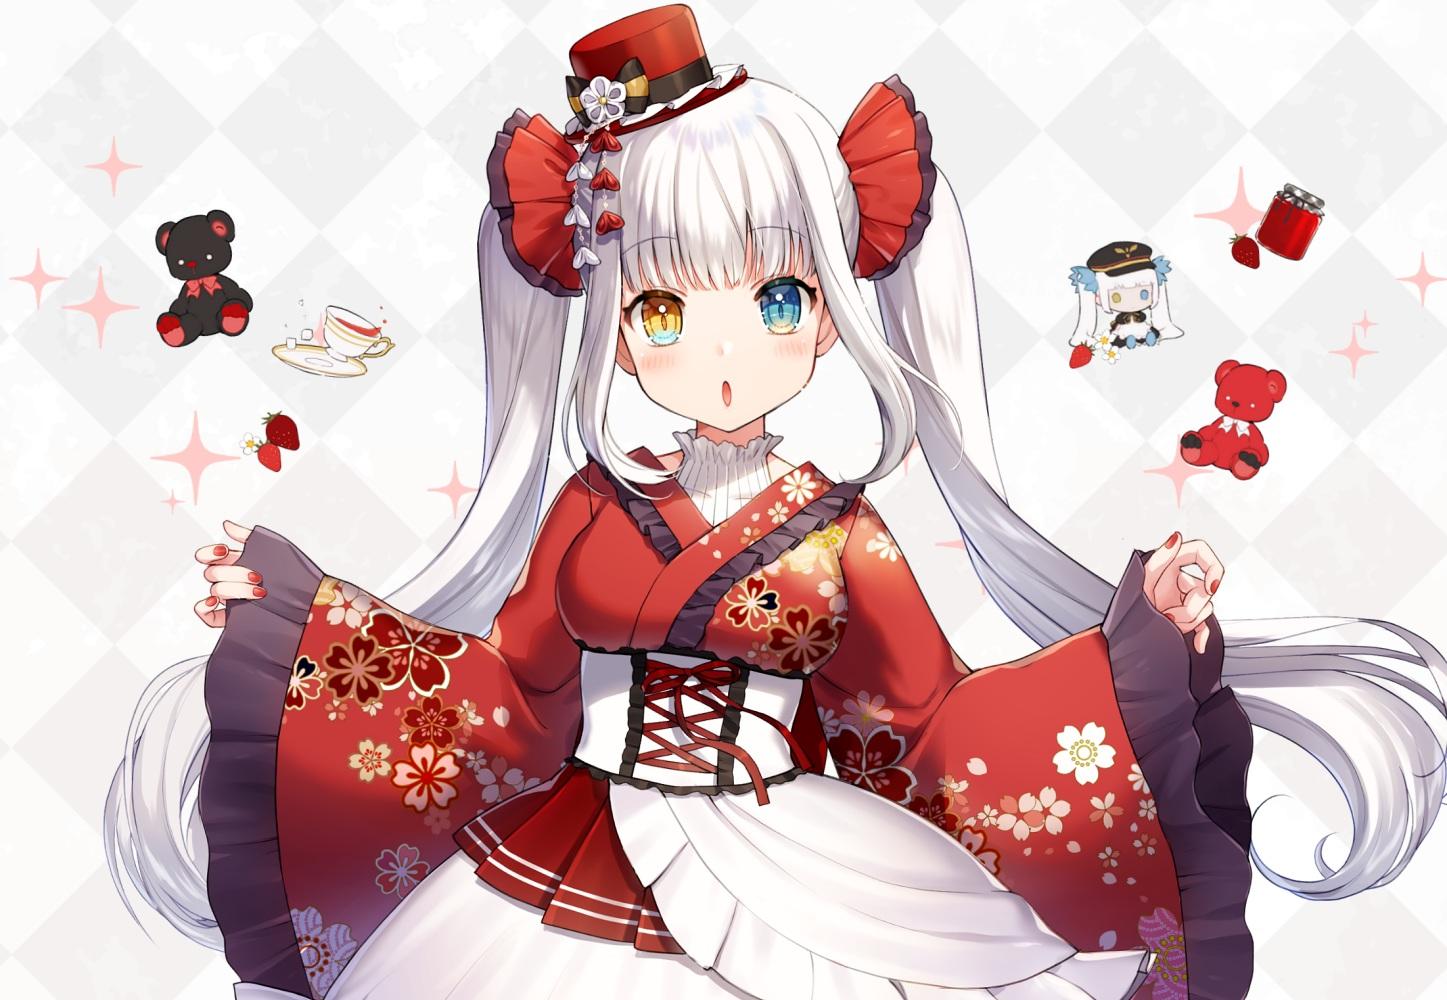 bicolored_eyes blush chibi dress drink hat japanese_clothes kagura_mea kagura_mea_channel lolita_fashion long_hair momoshiki_tsubaki teddy_bear white_hair